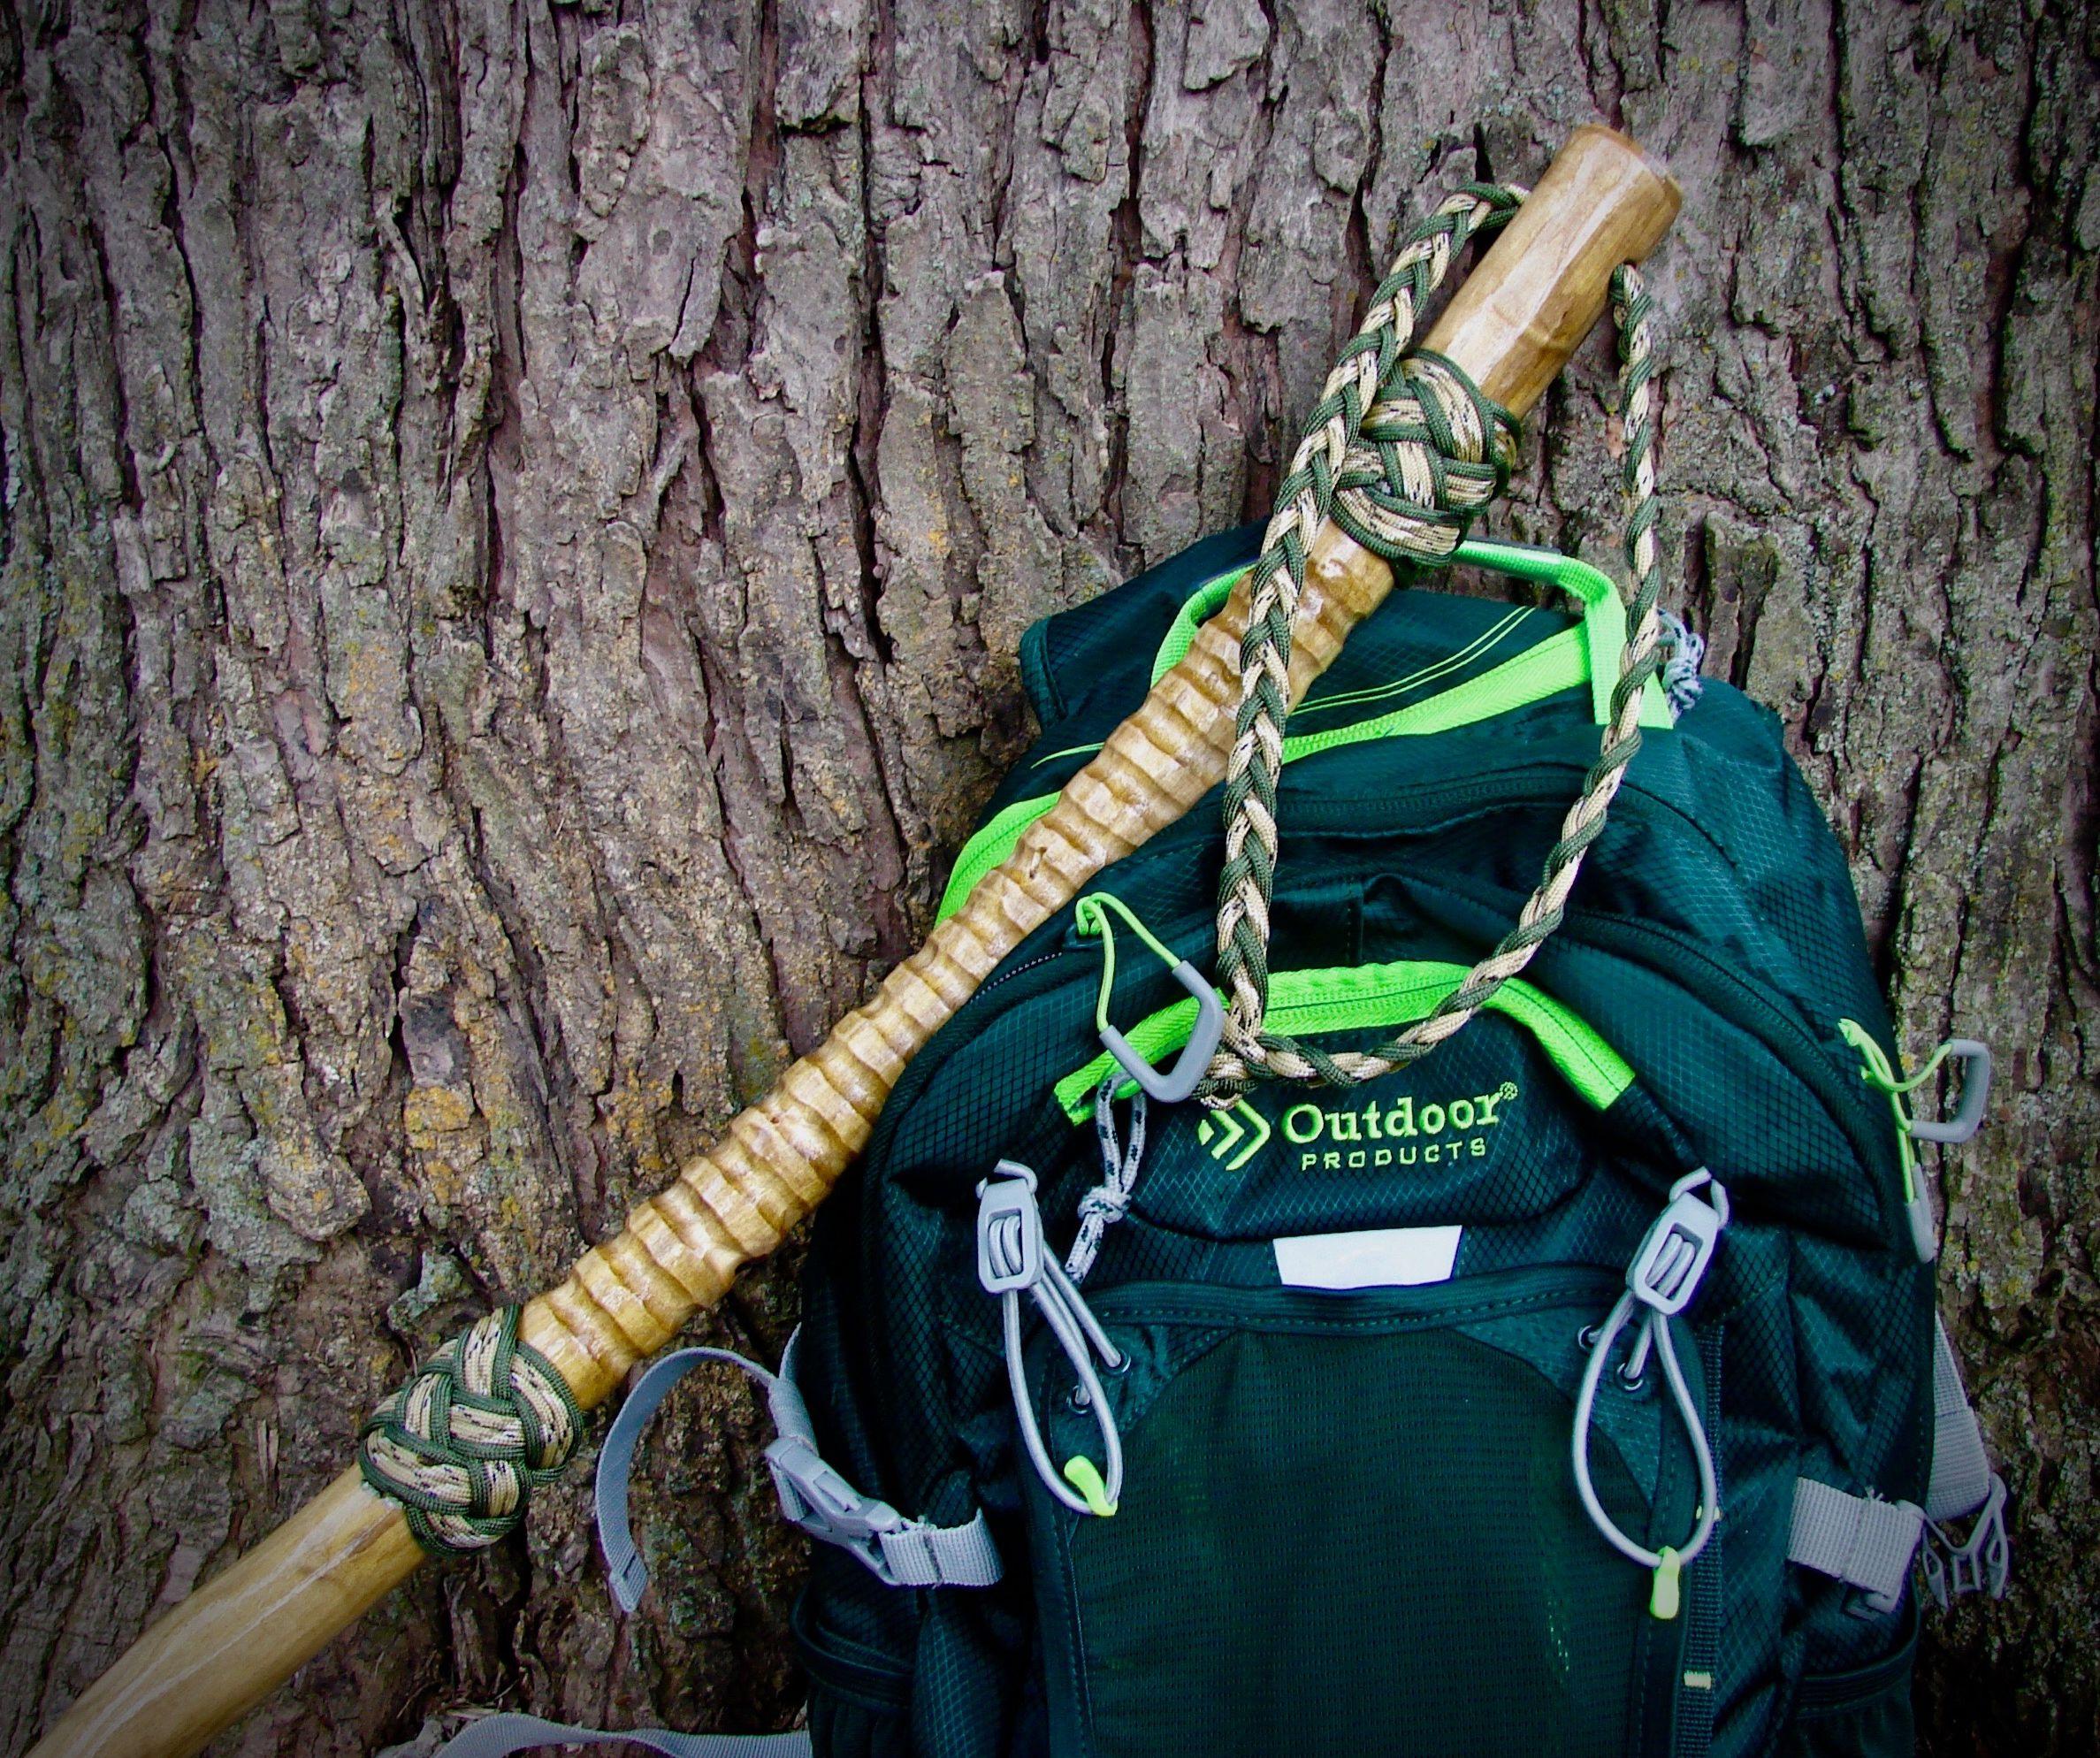 CANES GREEN BRAIDED WRIST STRAP FOR WALKING STICKS